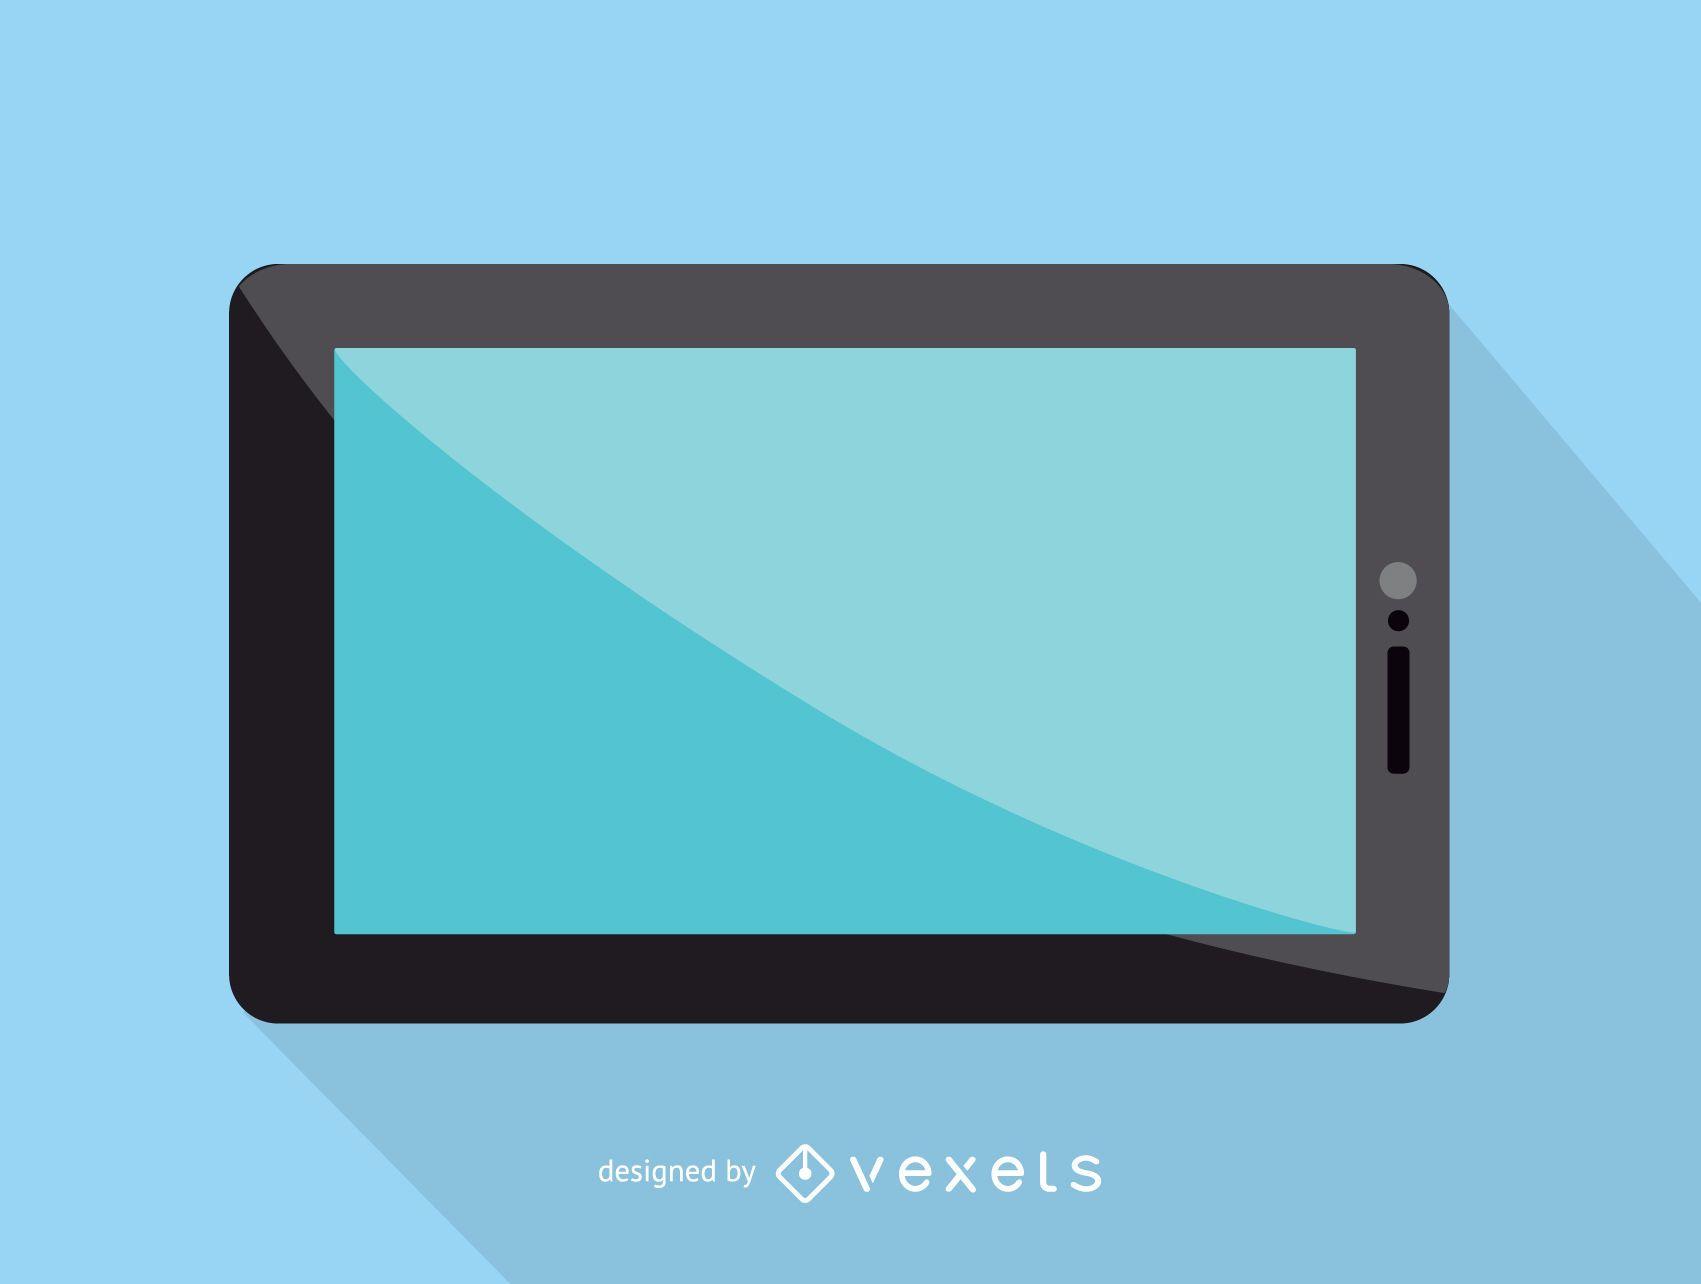 Tablet touchscreen icon